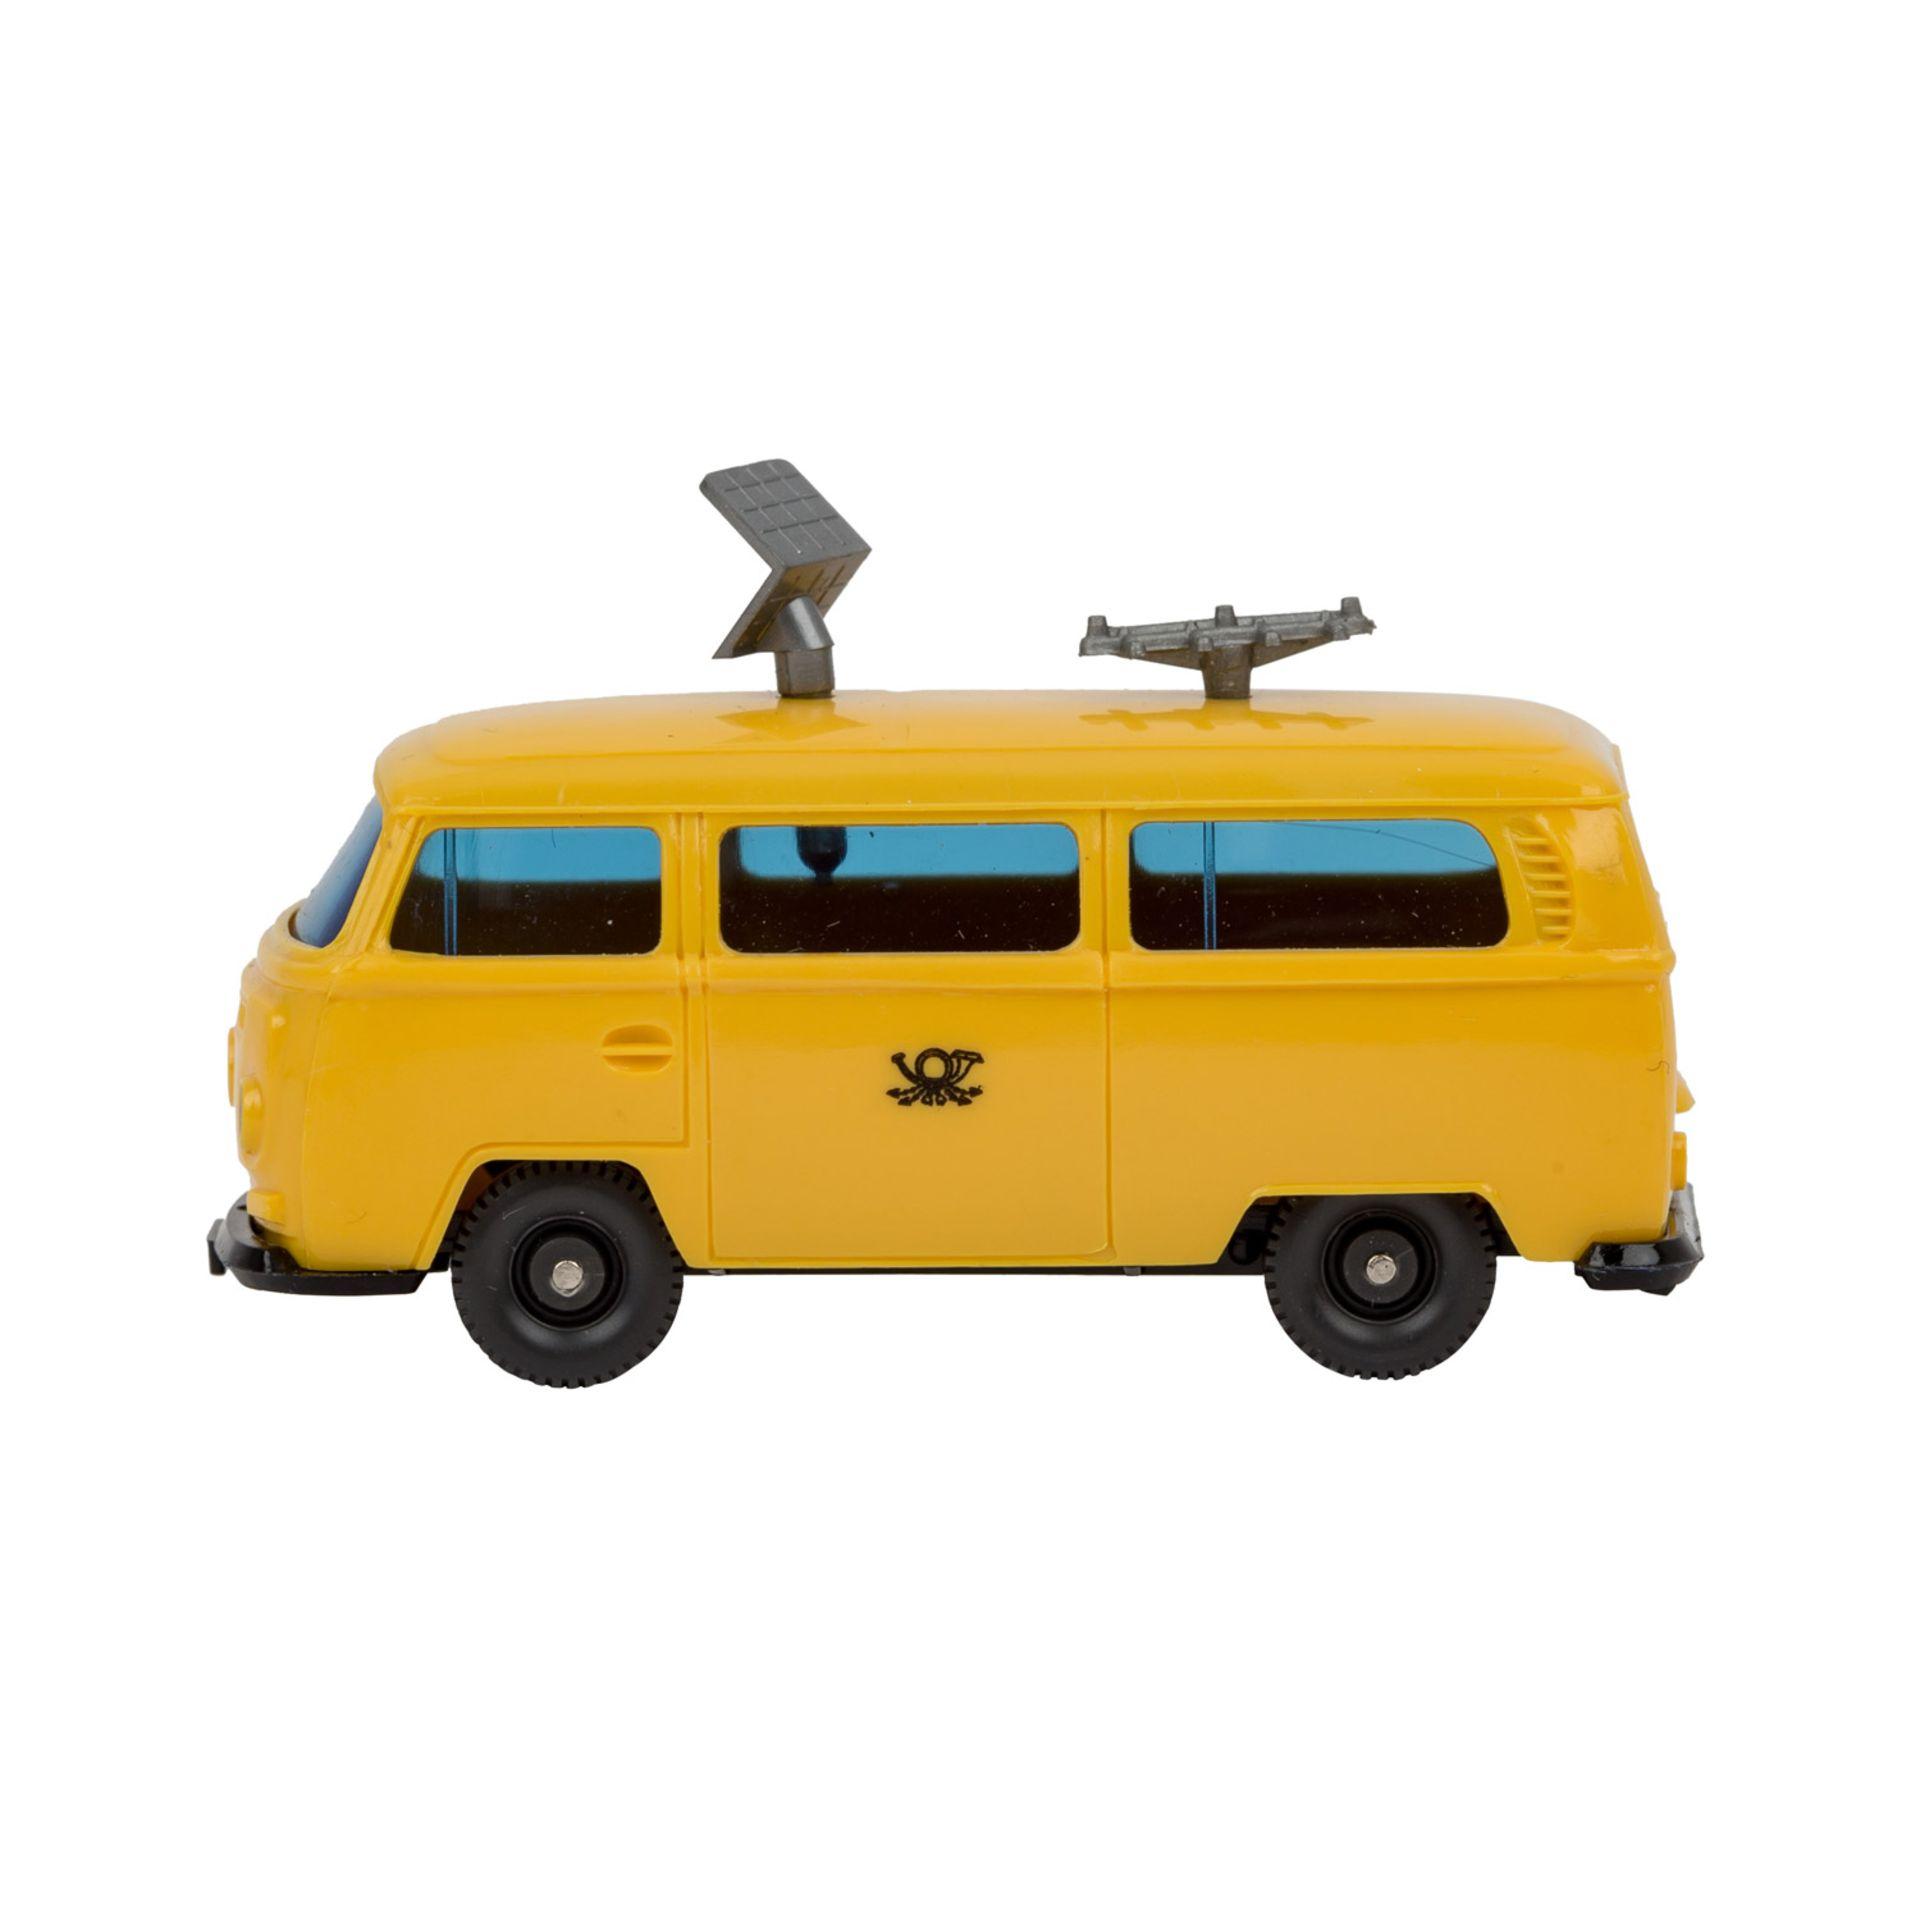 WIKING VW Bus T2 'Funkmesswagen', 1972-77,gelbe Karosserie, blaugetönte Verglasung, s - Image 2 of 5